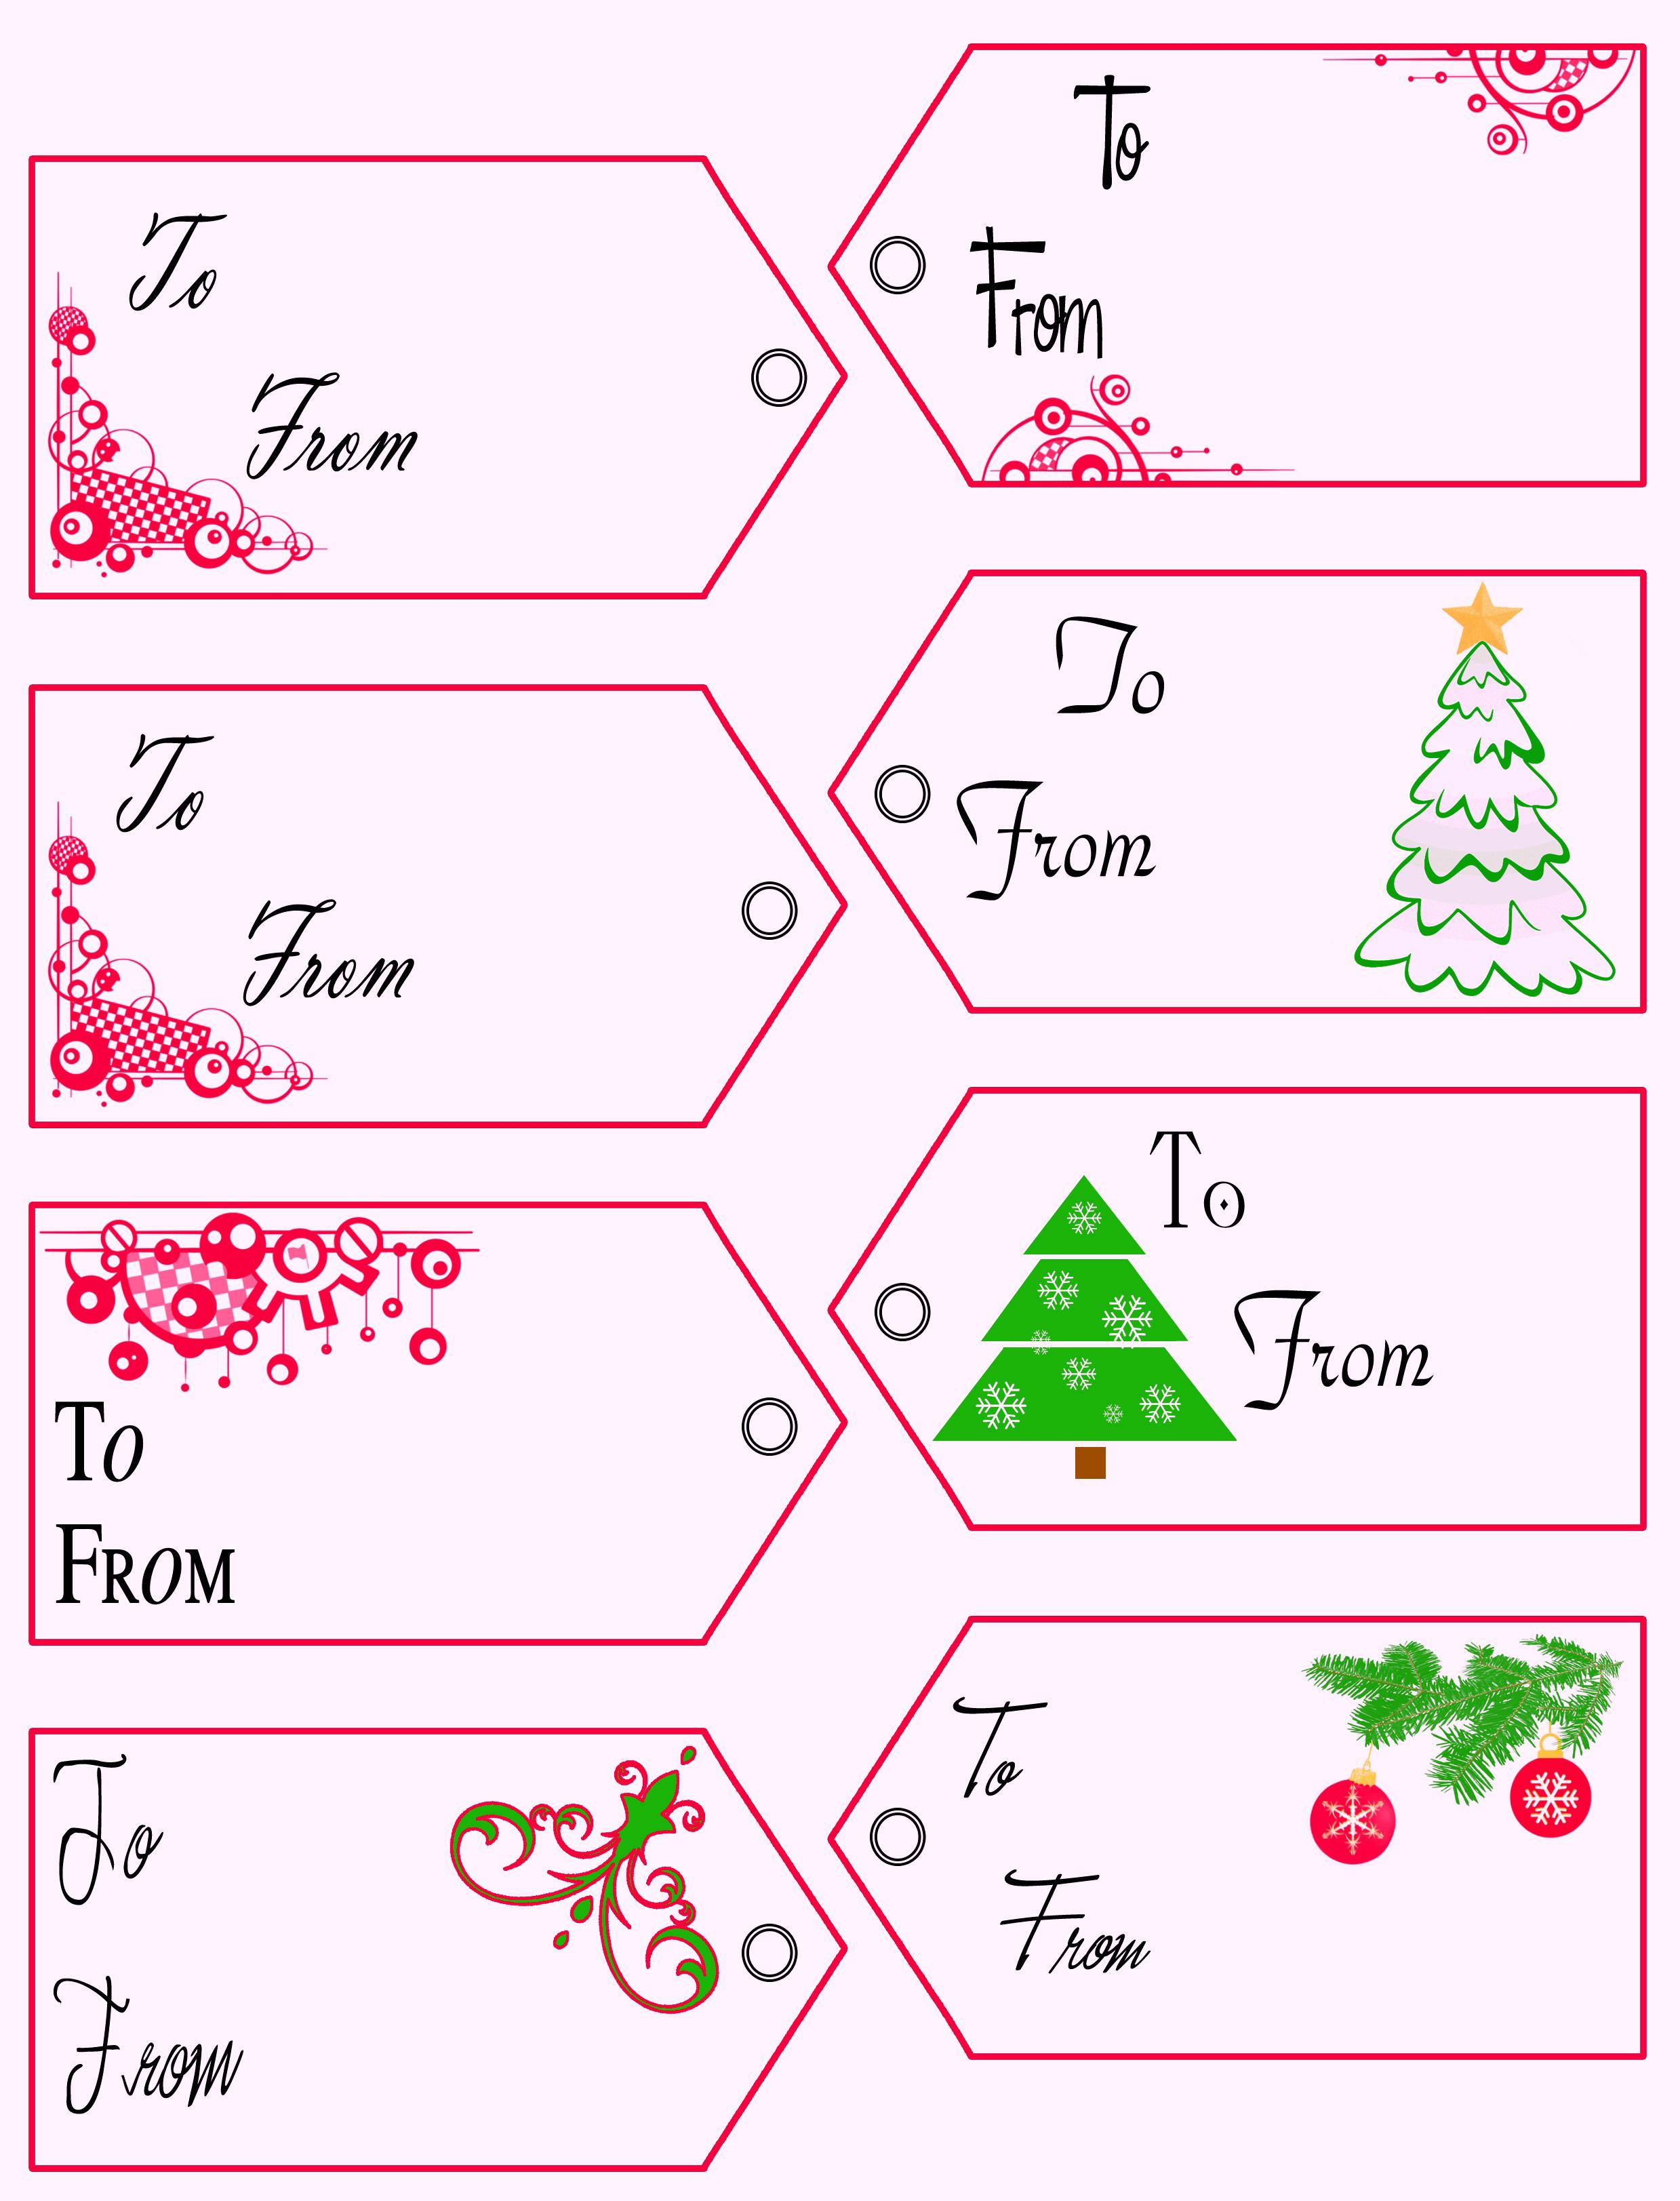 022 Printable Gift Tags Templates Birthday Tag Template ~ Ulyssesroom - Free Printable Gift Tag Templates For Word